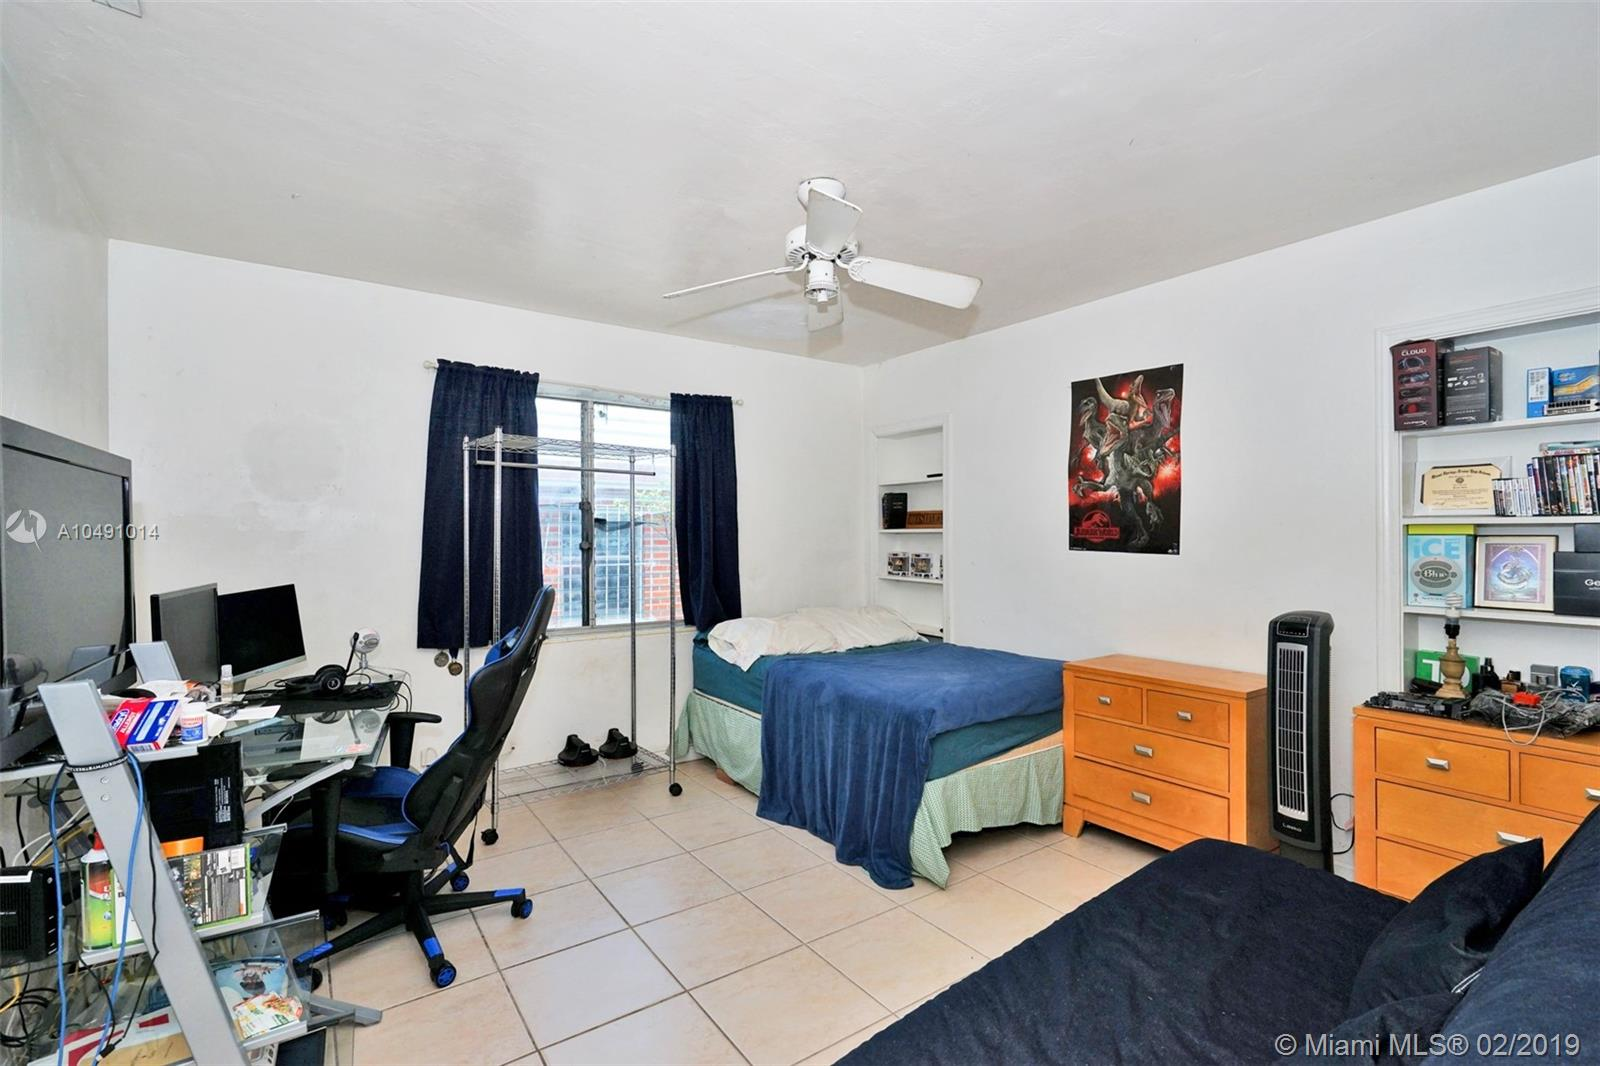 30 Nw 41st St, Miami FL, 33127